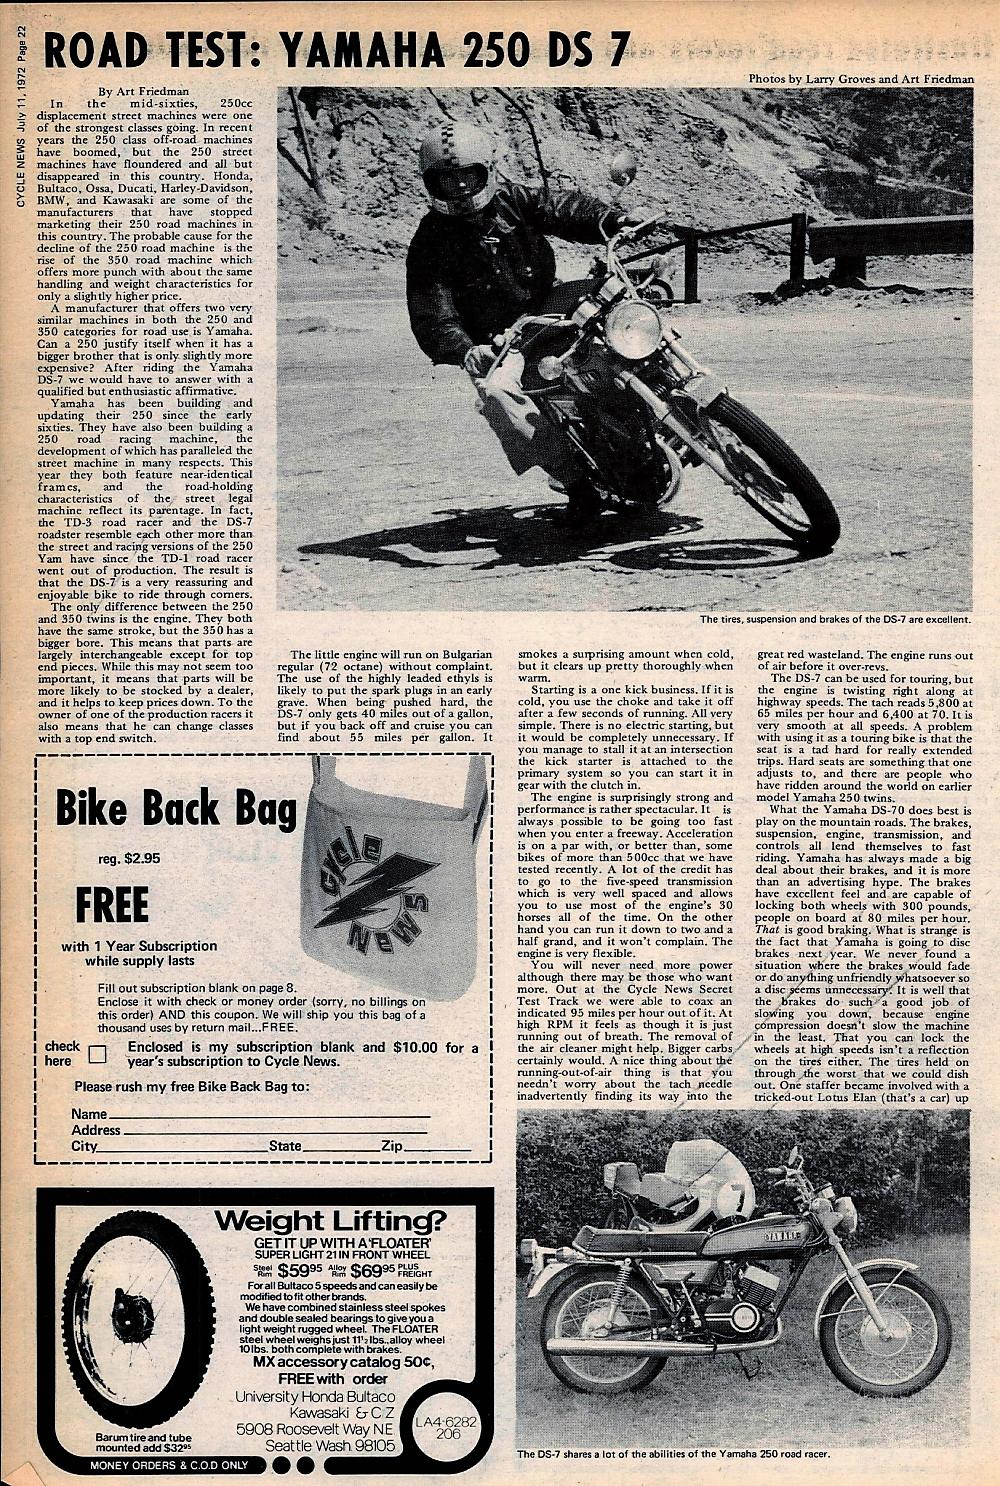 1972 Yamaha 250 DS 7 road test.1..jpg